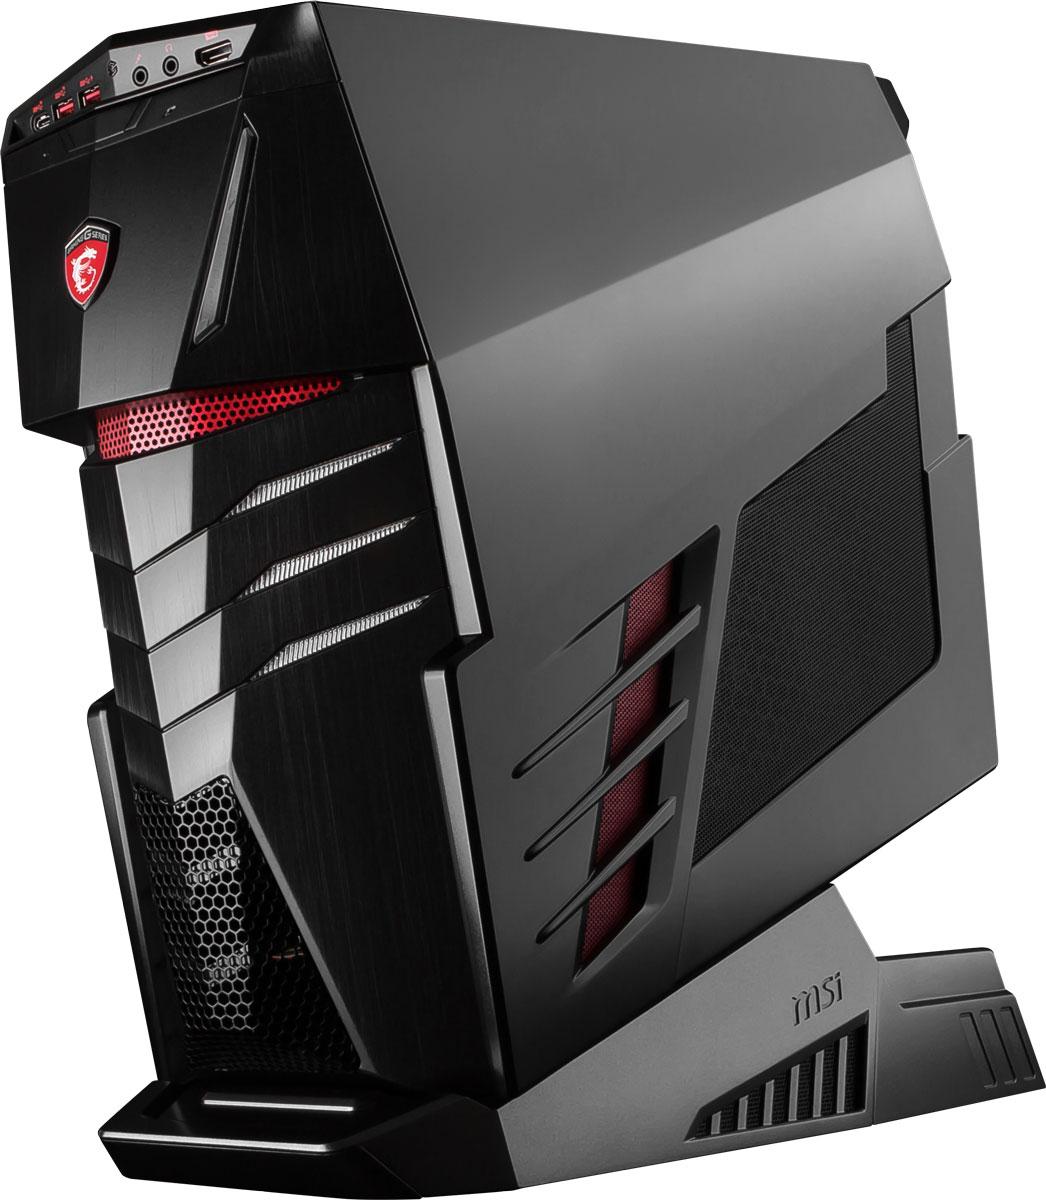 MSI Aegis Ti-024RU, Black настольный компьютер